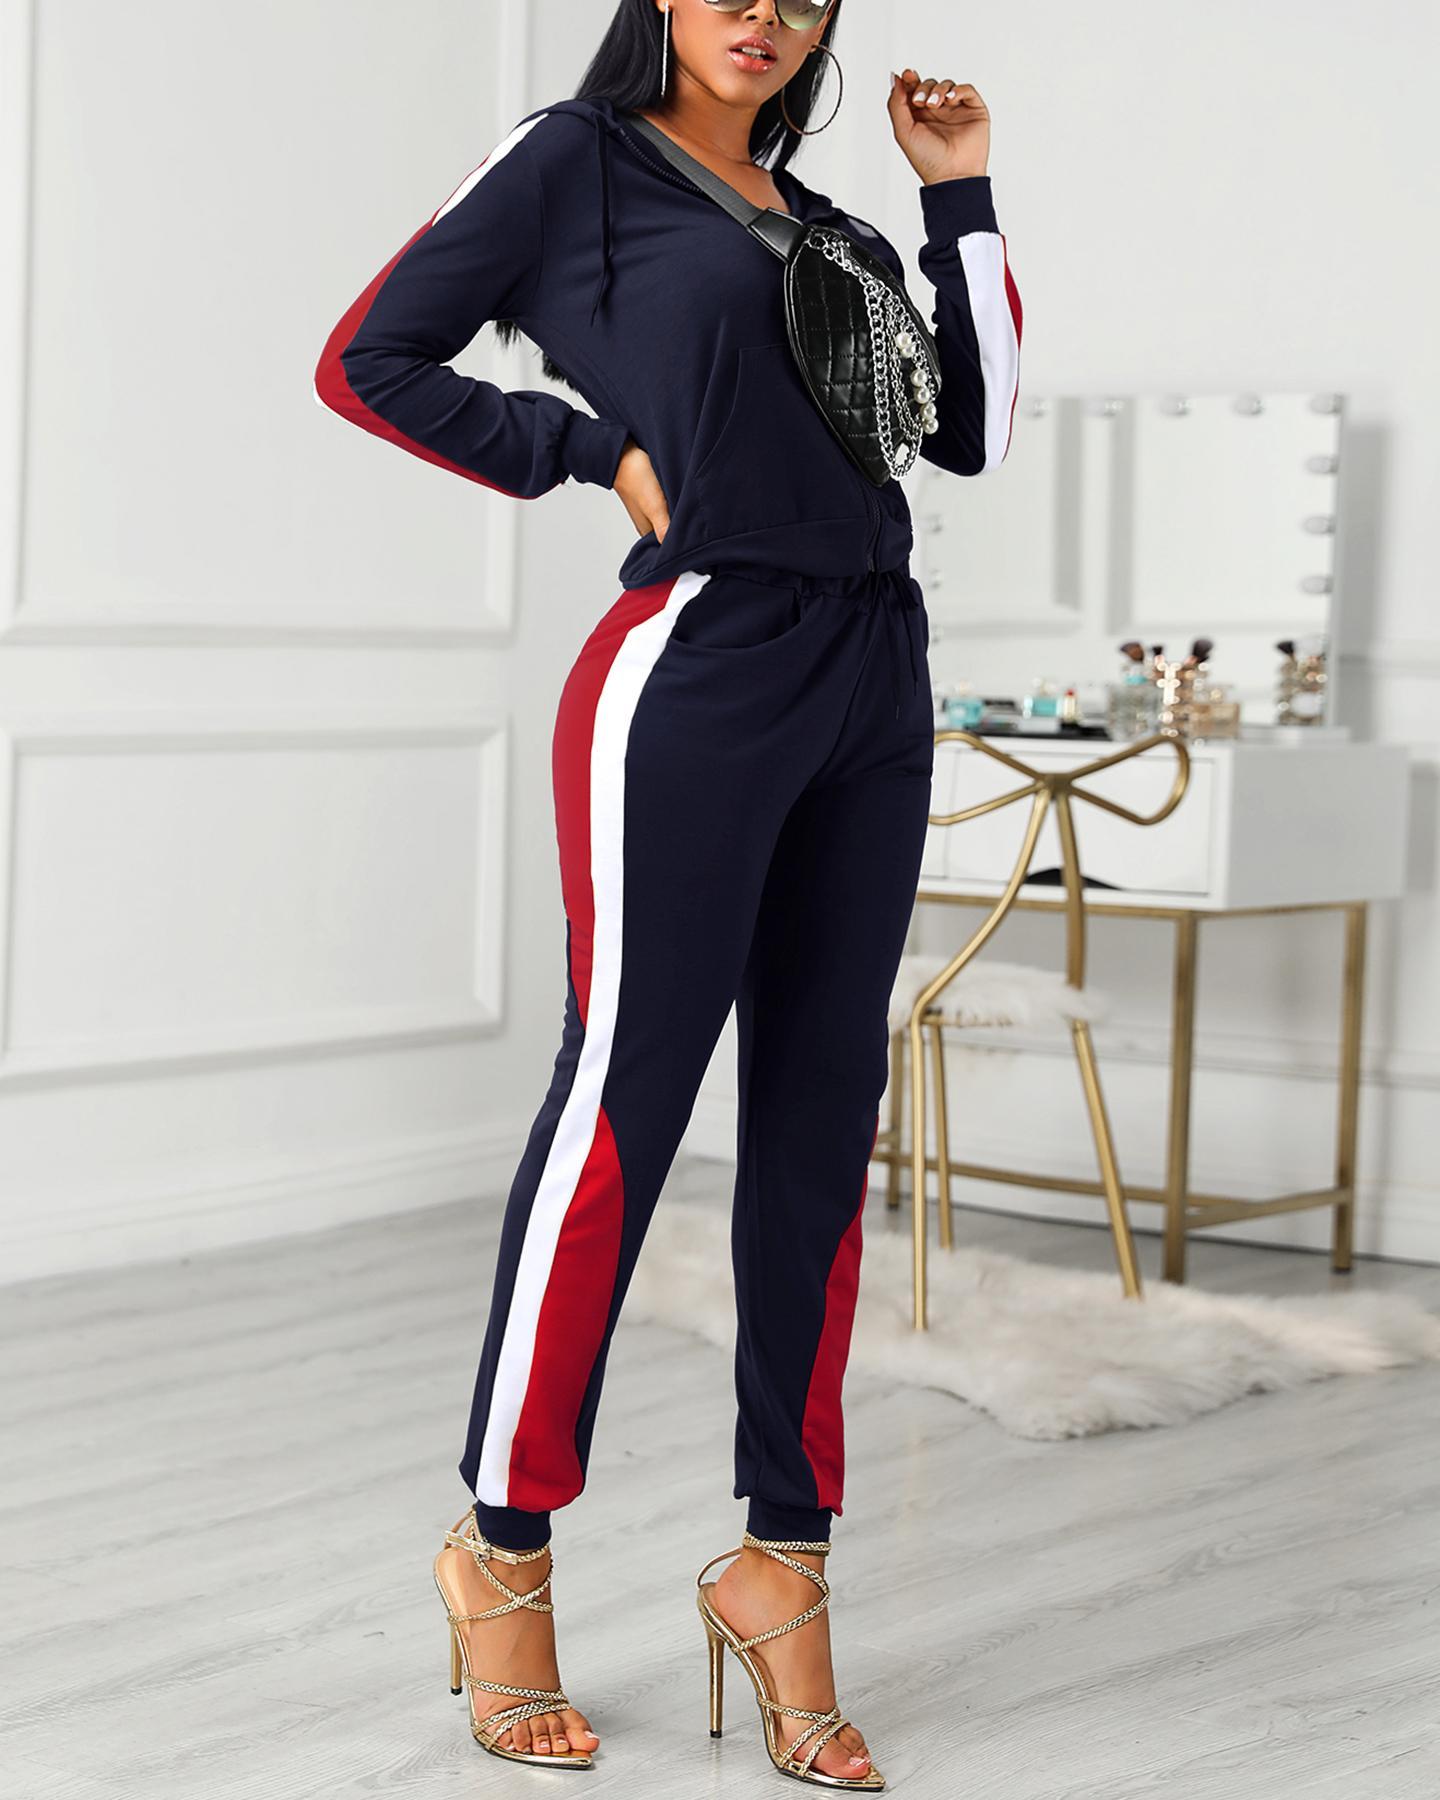 Colorblock Drawstring Design Zipped Top & Pant Sets, Dark blue